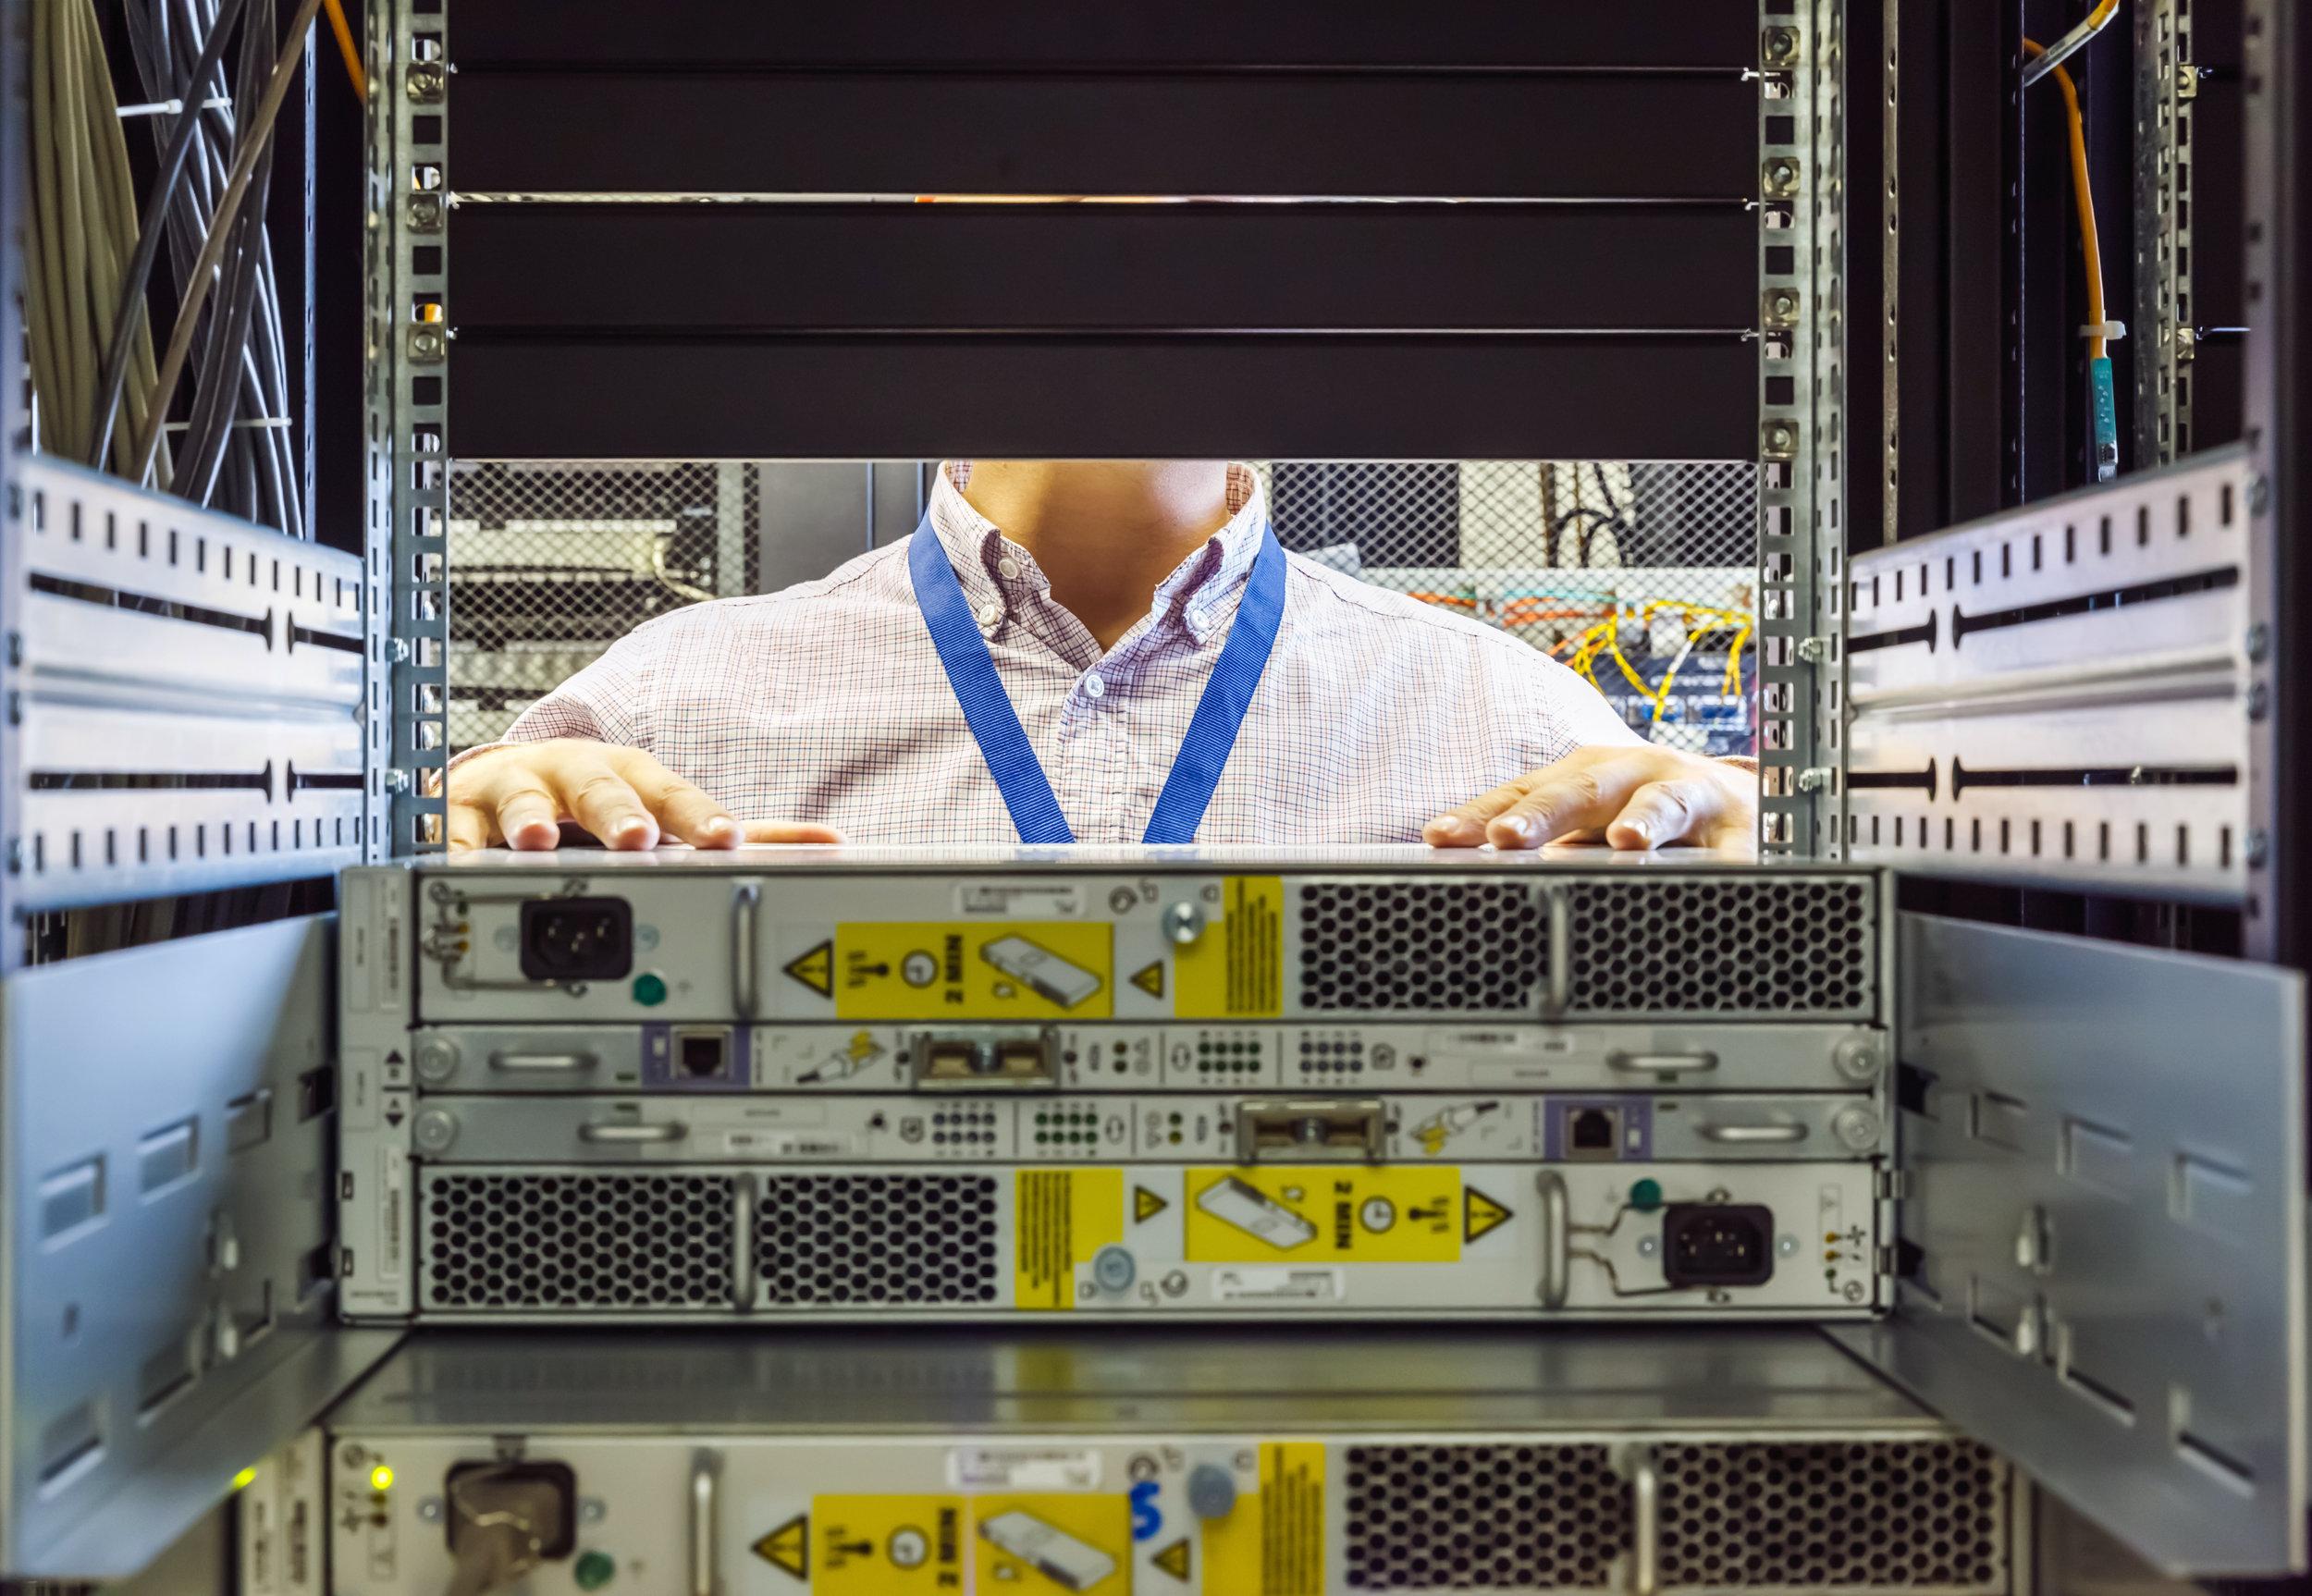 12-week Cybersecurity Hands-on Practitioner